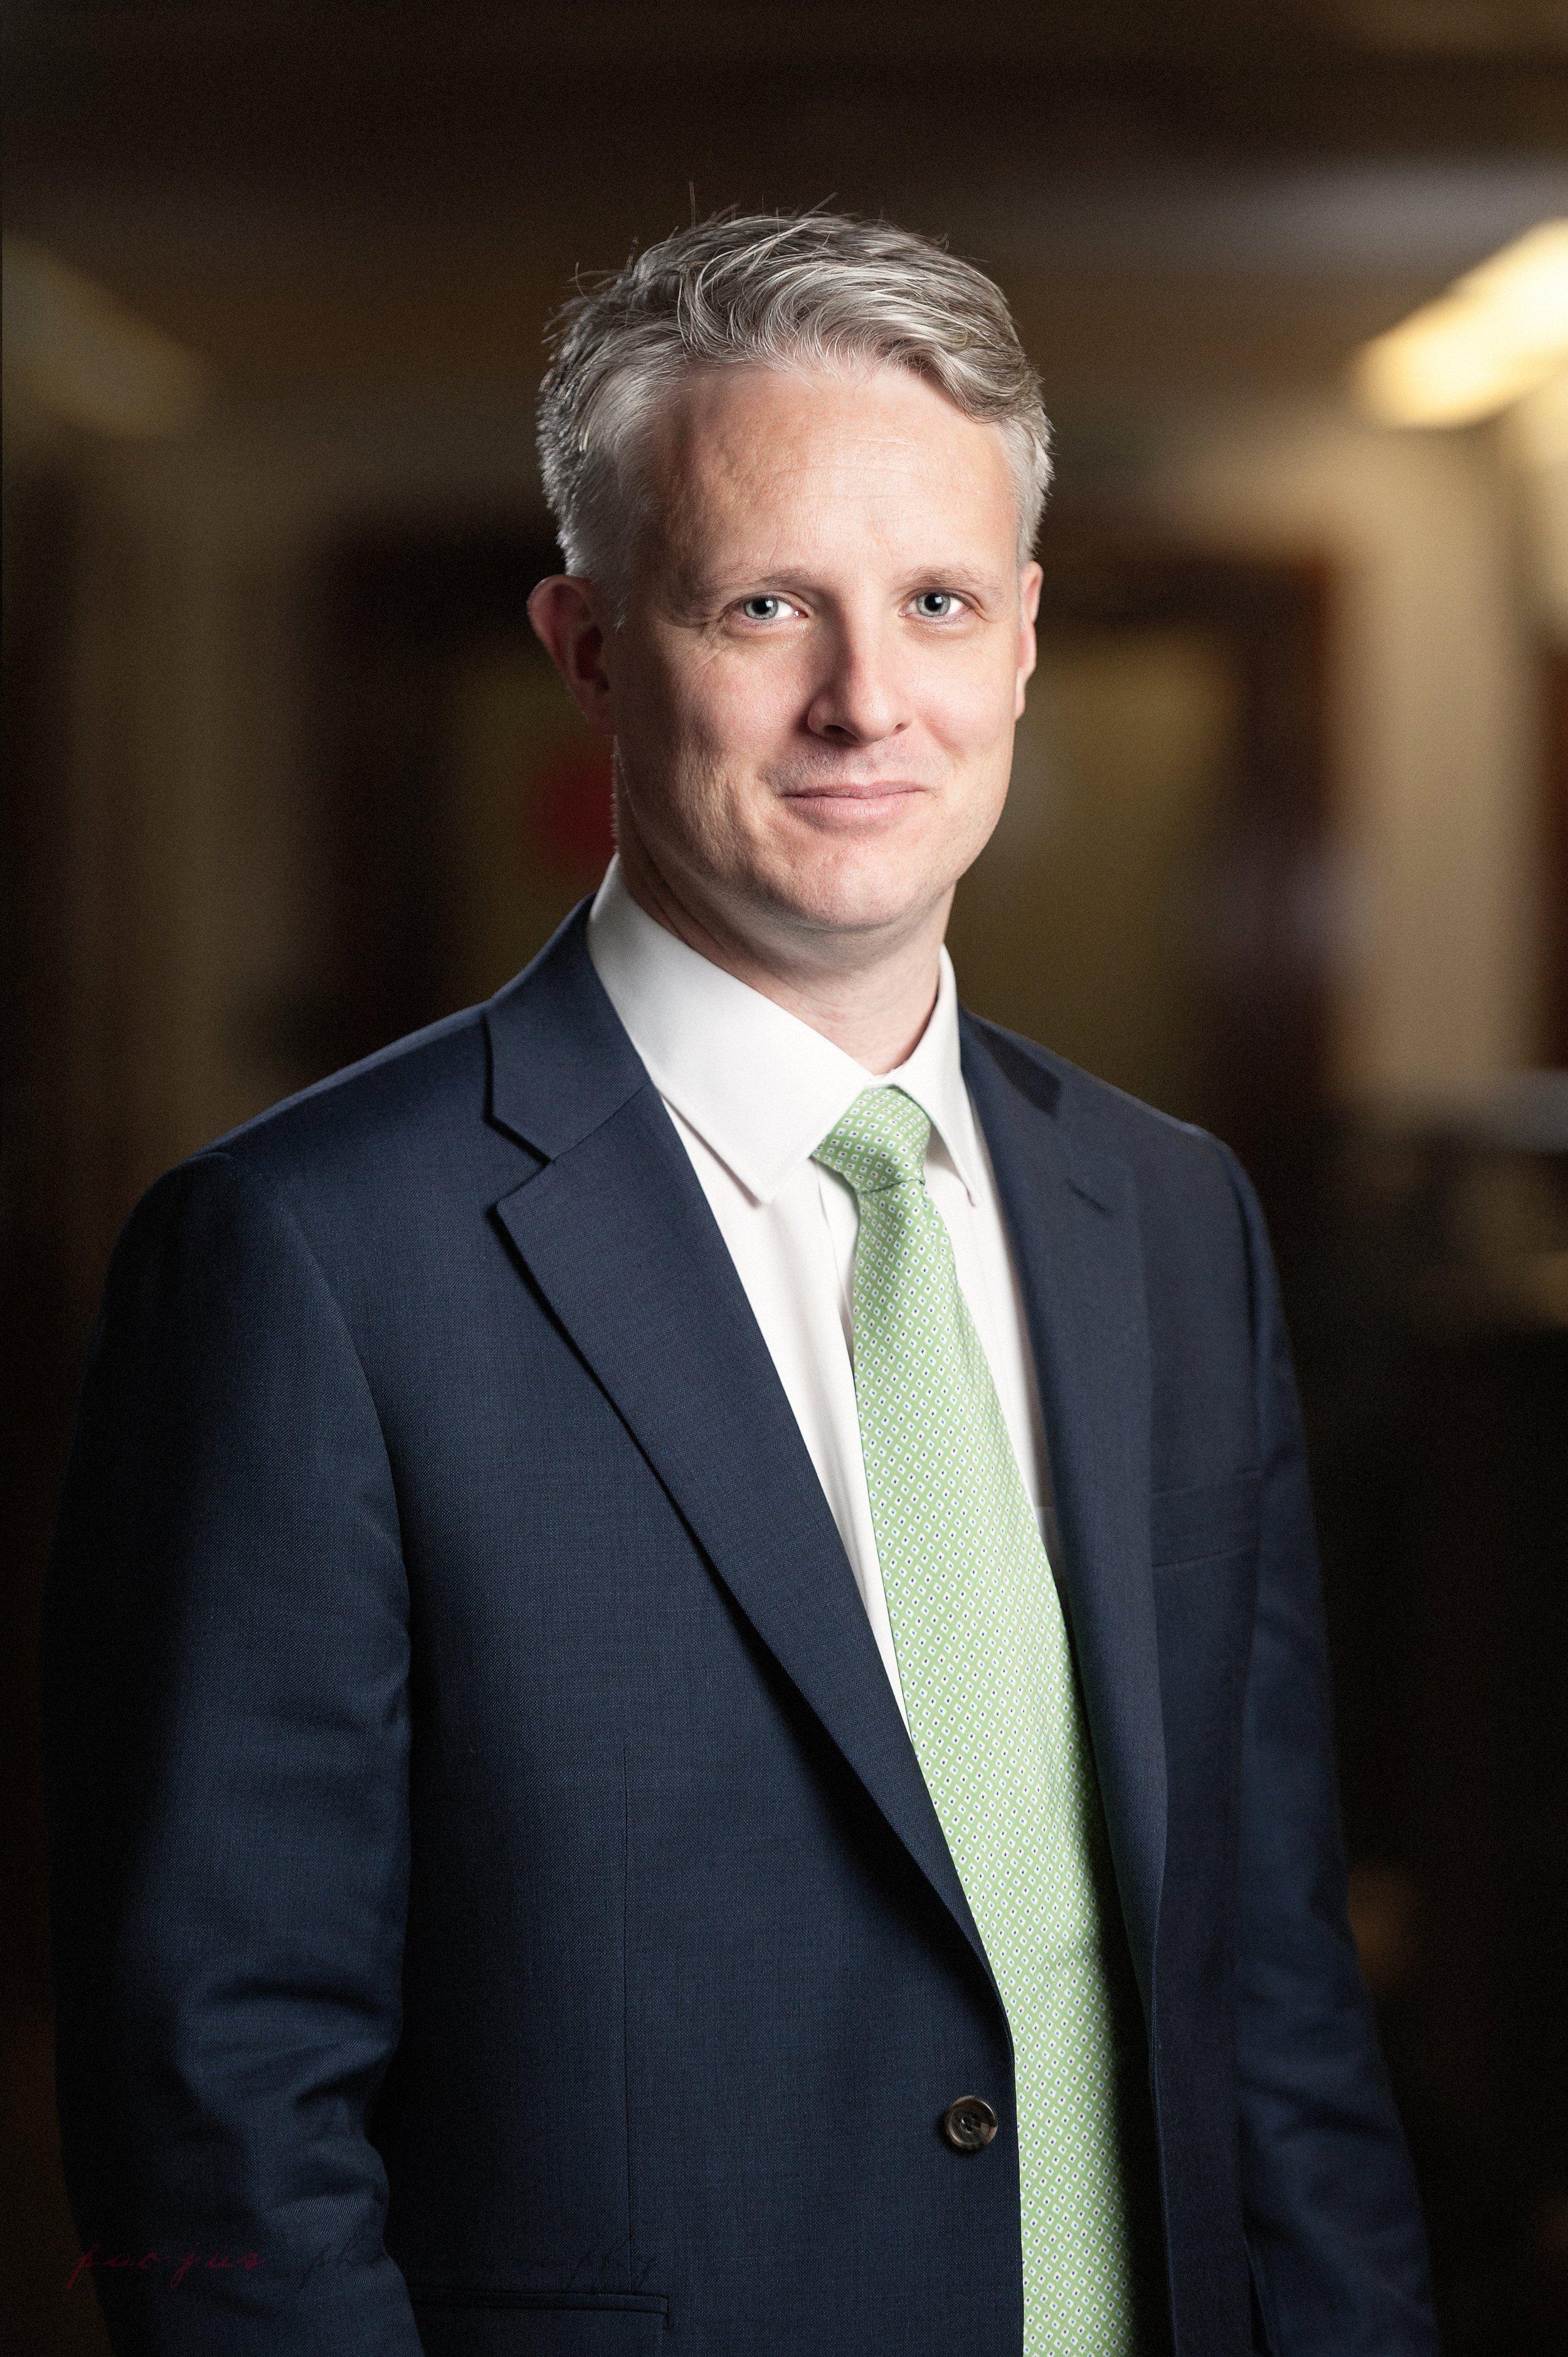 Tom Flynn cataract surgery laser eye surgery London 1.jpg